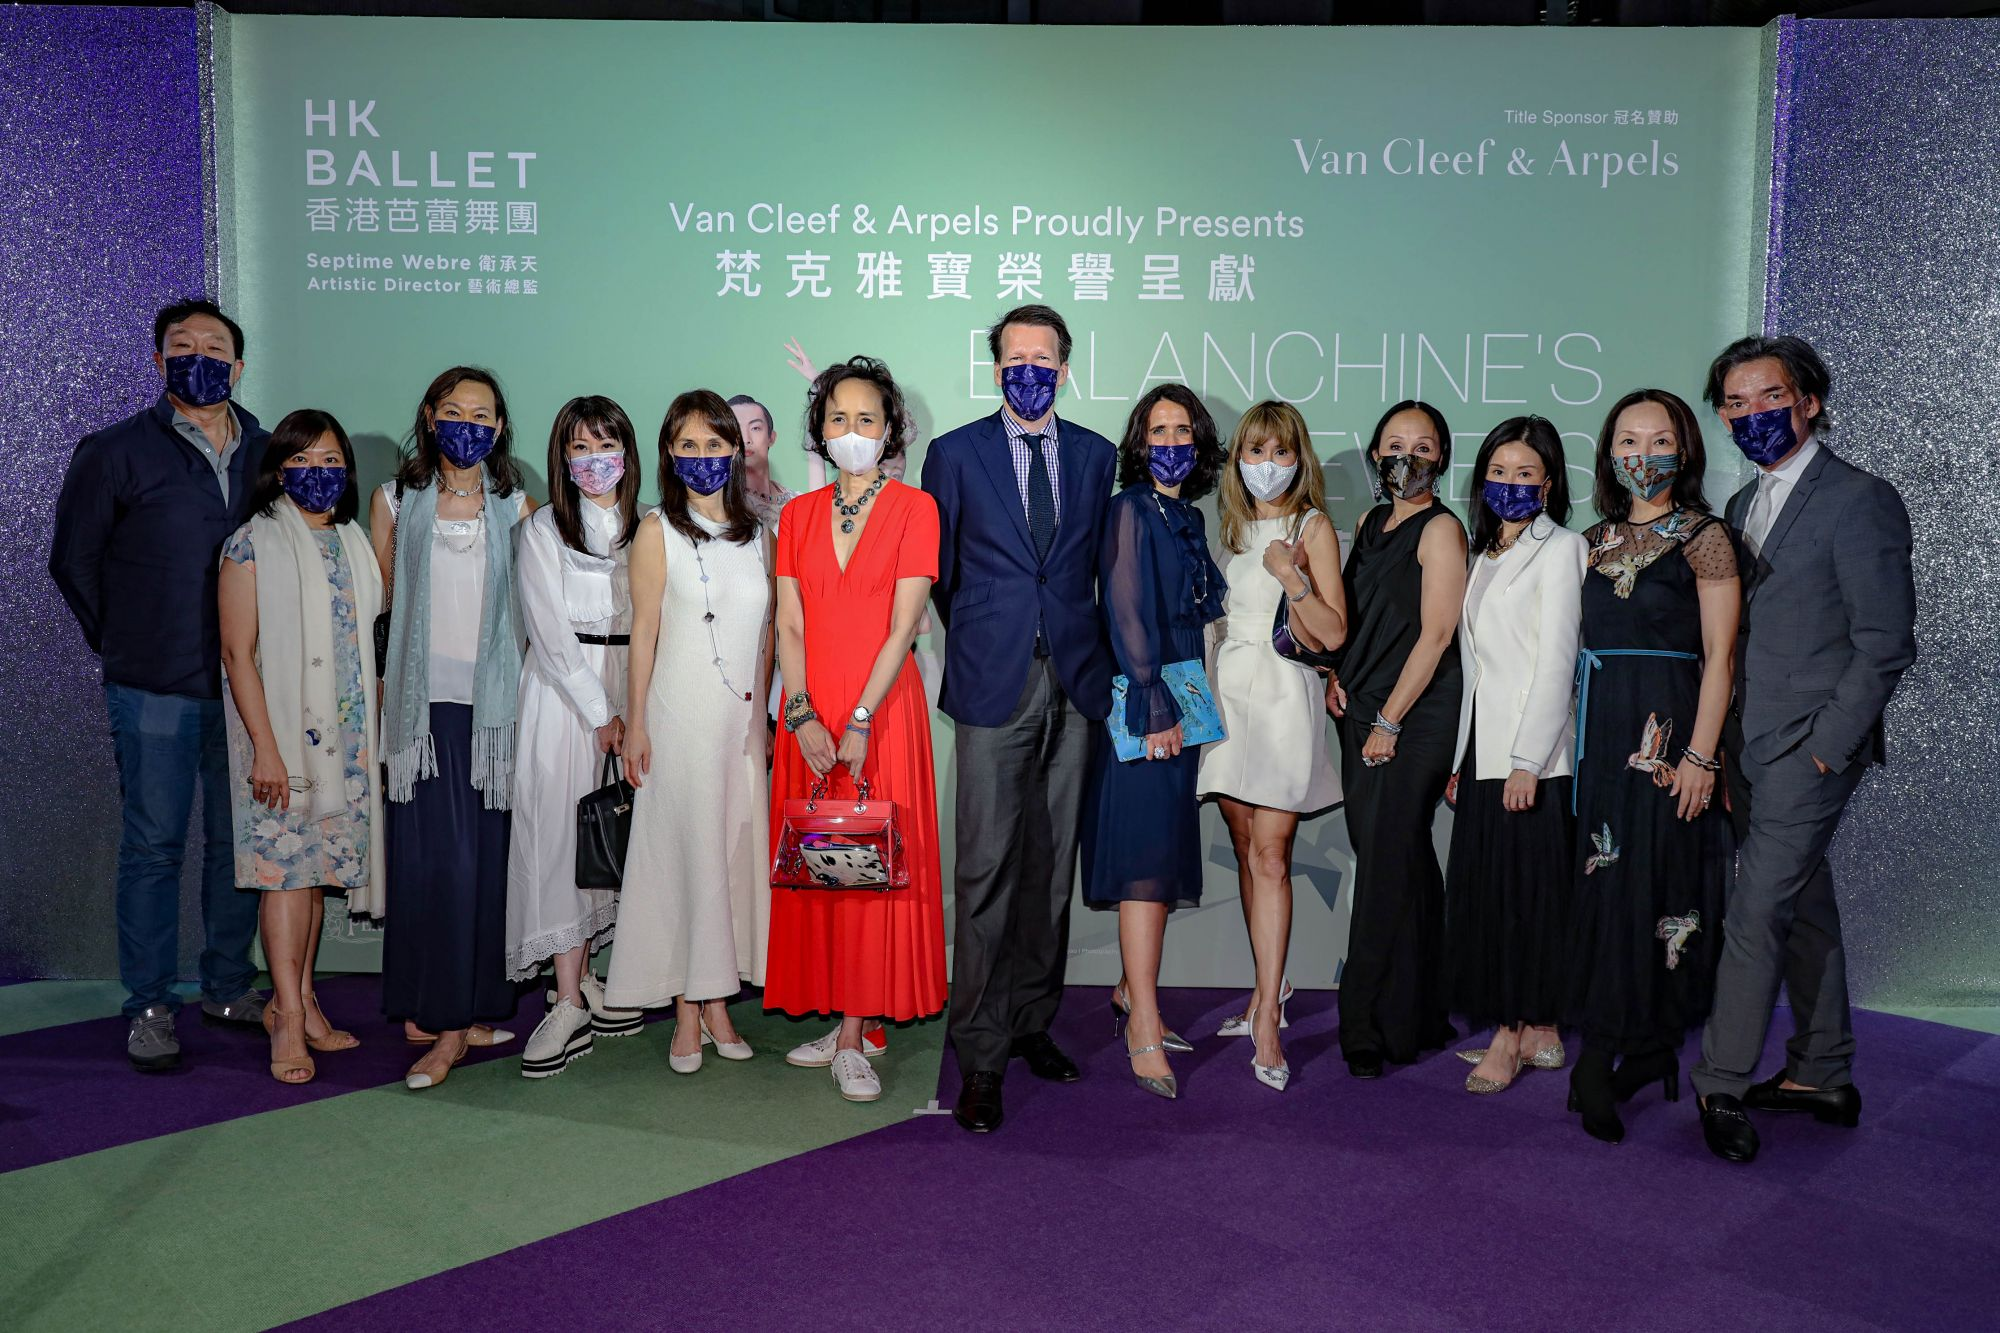 From left: Arthur Minshiang Wang, Heidi Lee, Evonne Tsui, Janice Chan-Choy, Daisy Ho, Victoria Lam, Nicolas Luchsinger, Julie Becker, Mira Yeh, Lindzay Chan, Liana Yung Yeung, Linda Fung and Septime Webre